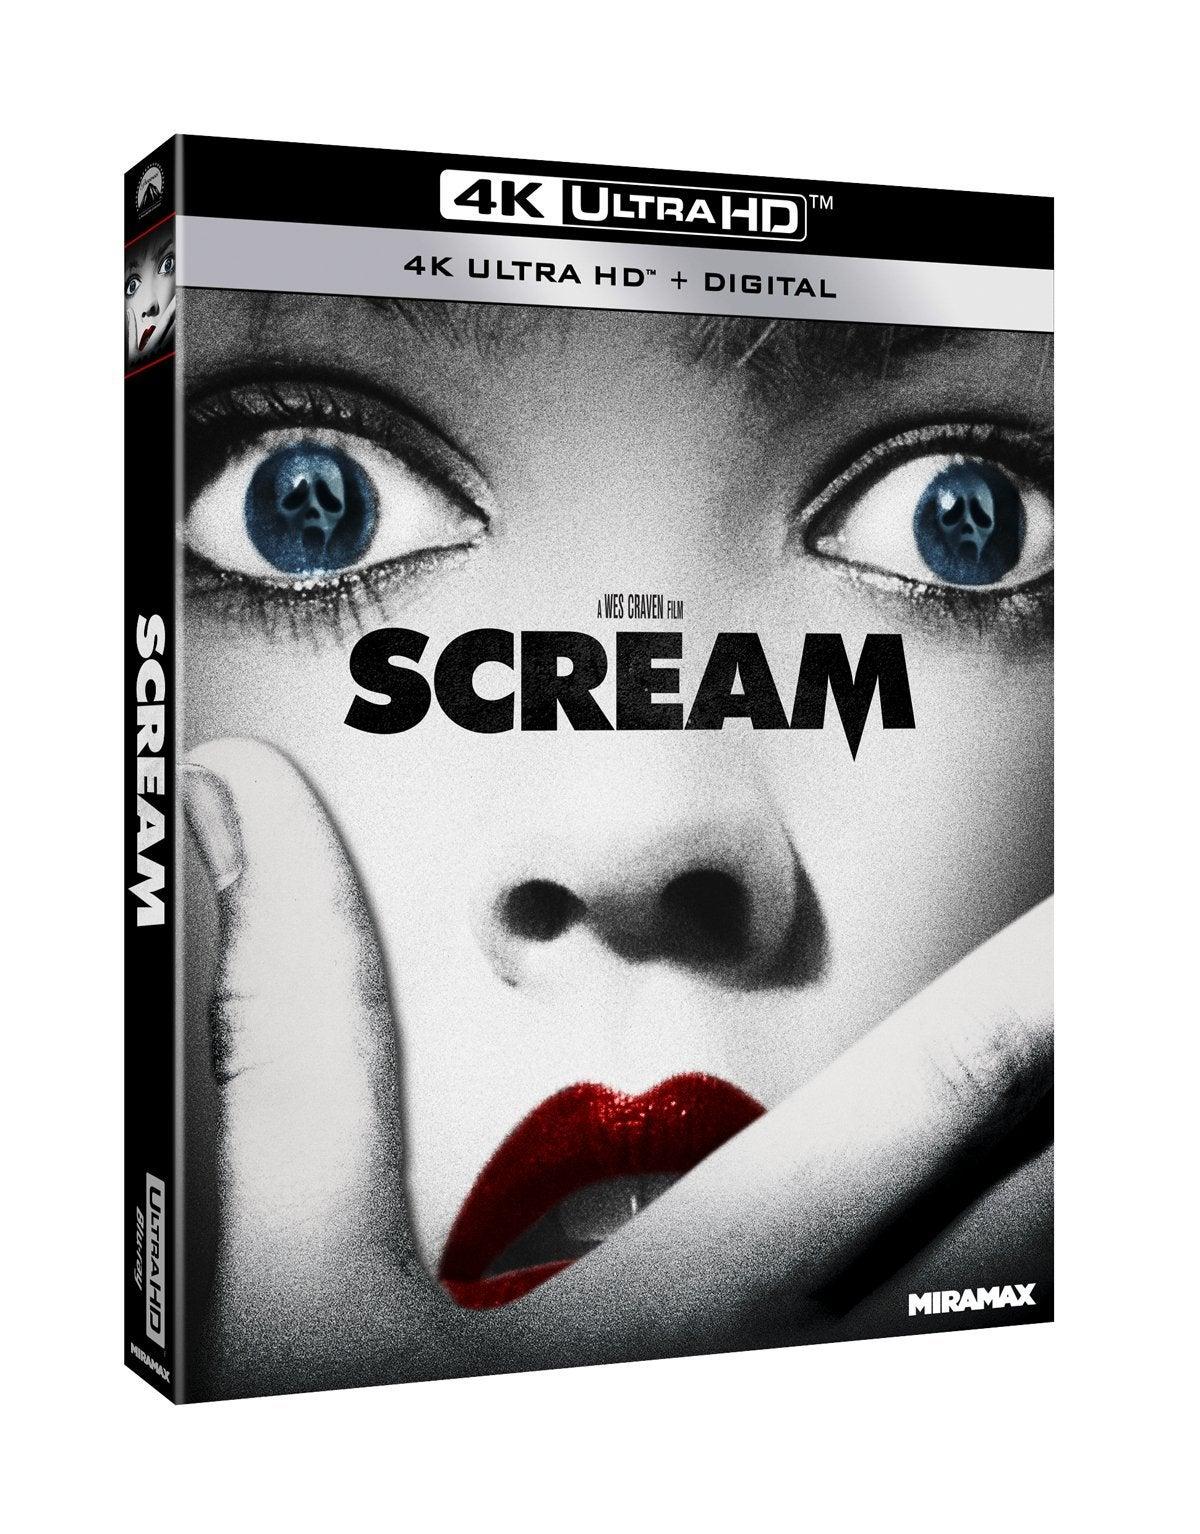 scream movie 4k ultra hd blu ray cover